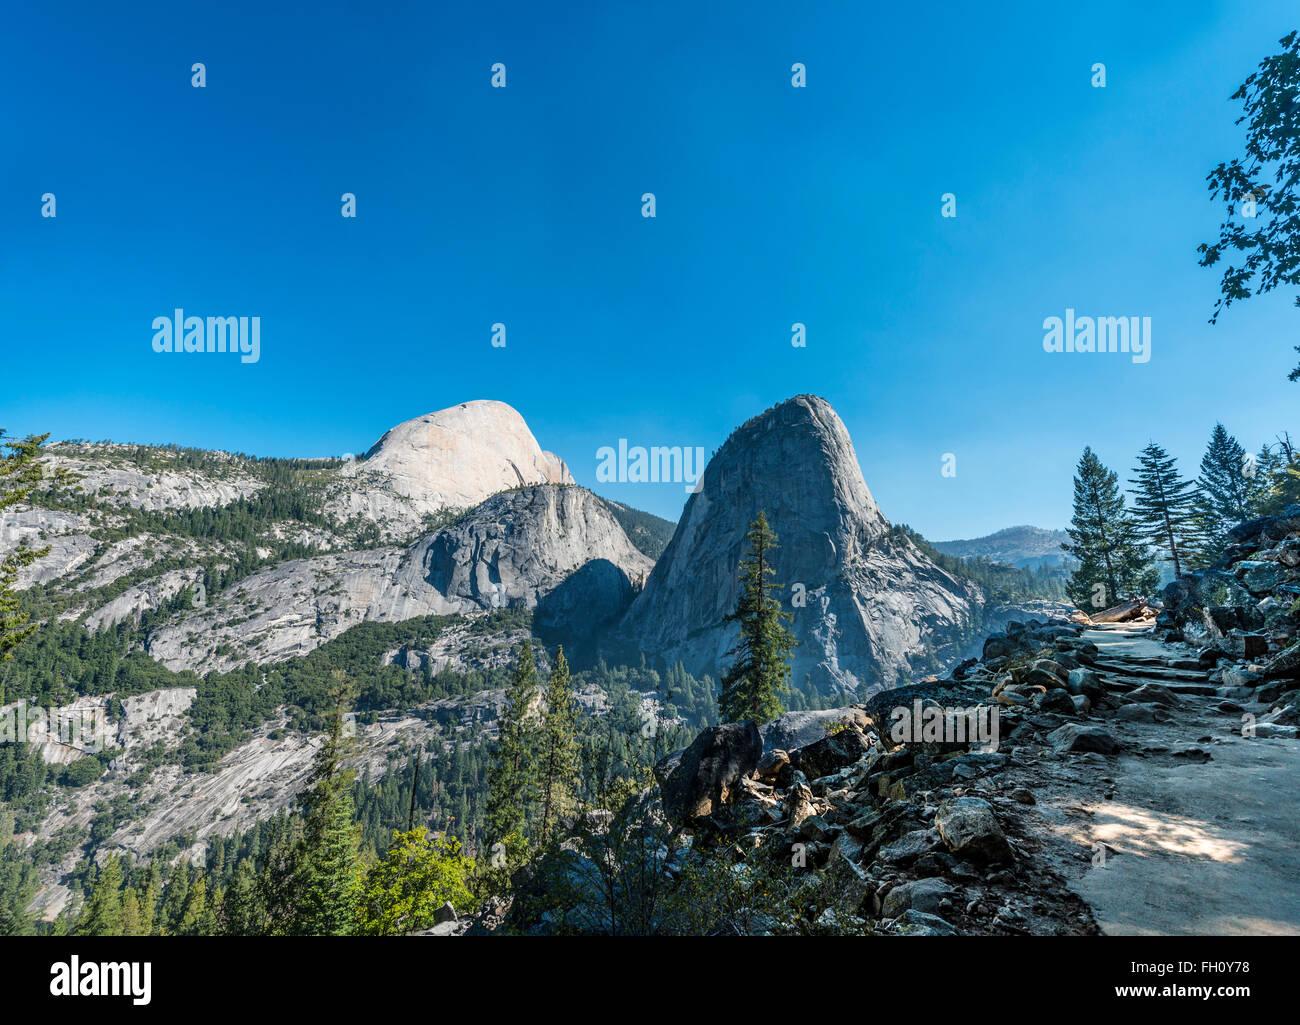 Liberty Cap, Yosemite National Park, California, USA, North America Stock Photo